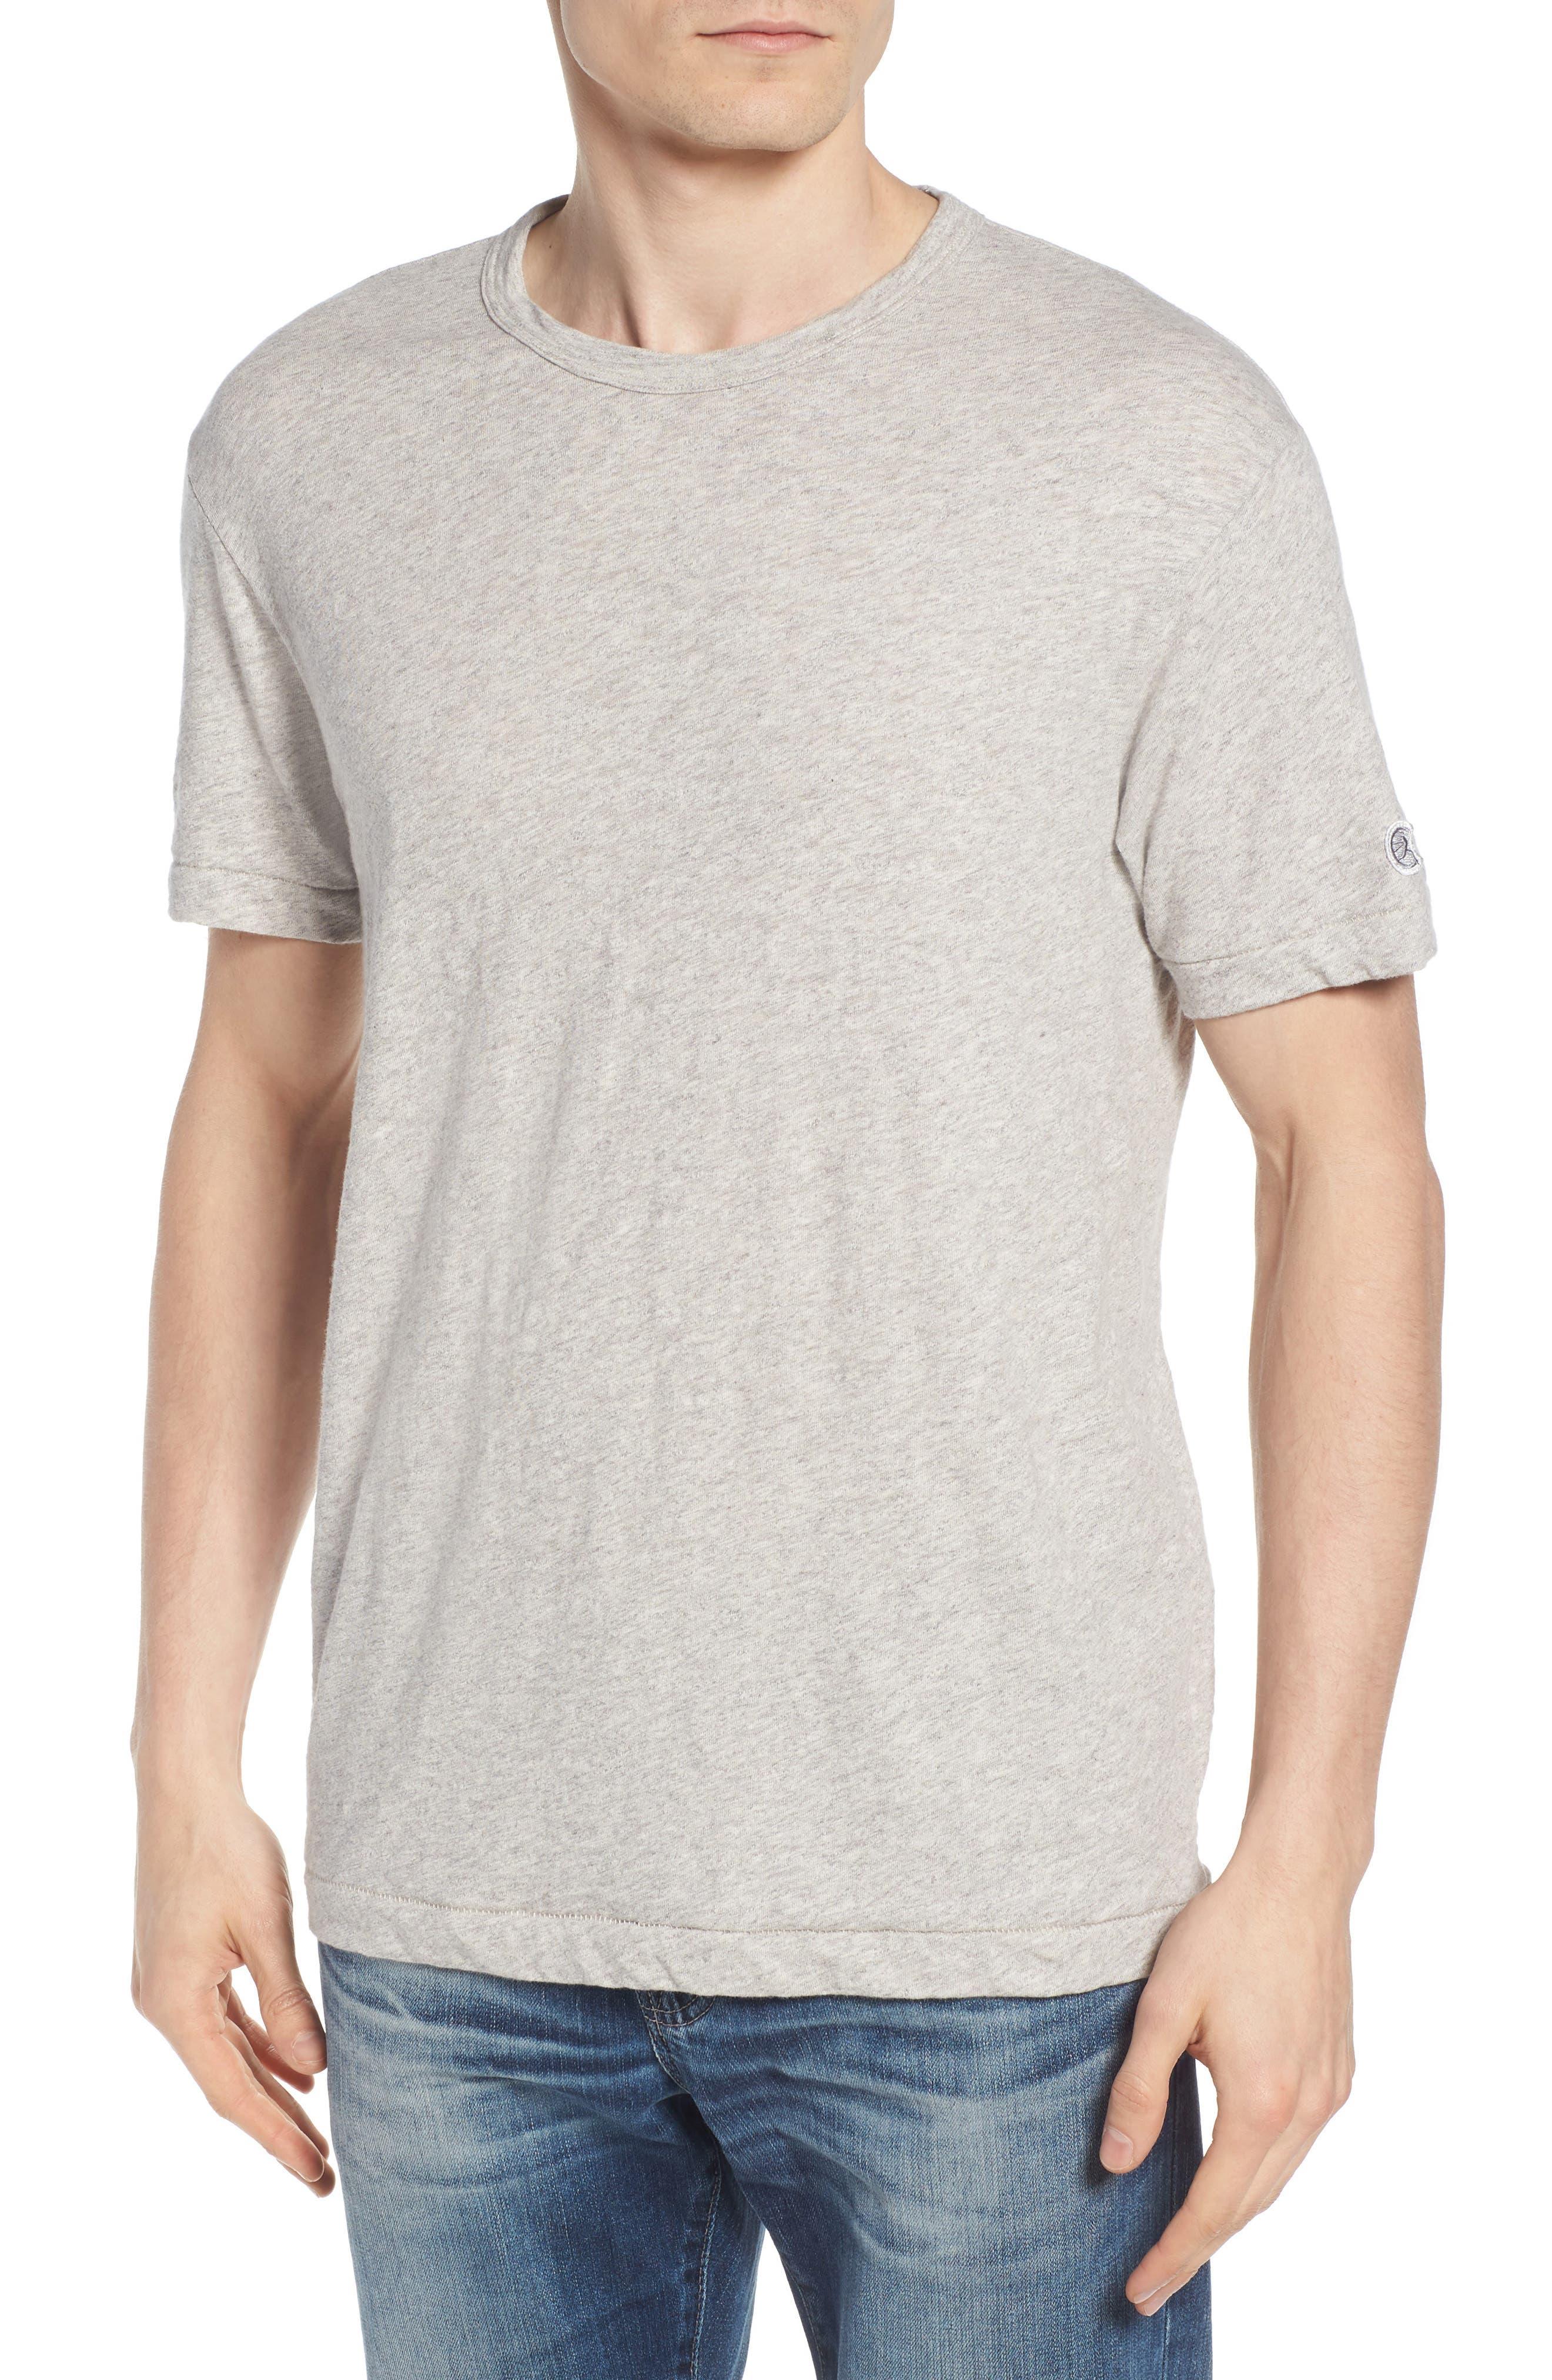 + Champion Heathered Crewneck T-Shirt,                         Main,                         color, Antique Grey Mix